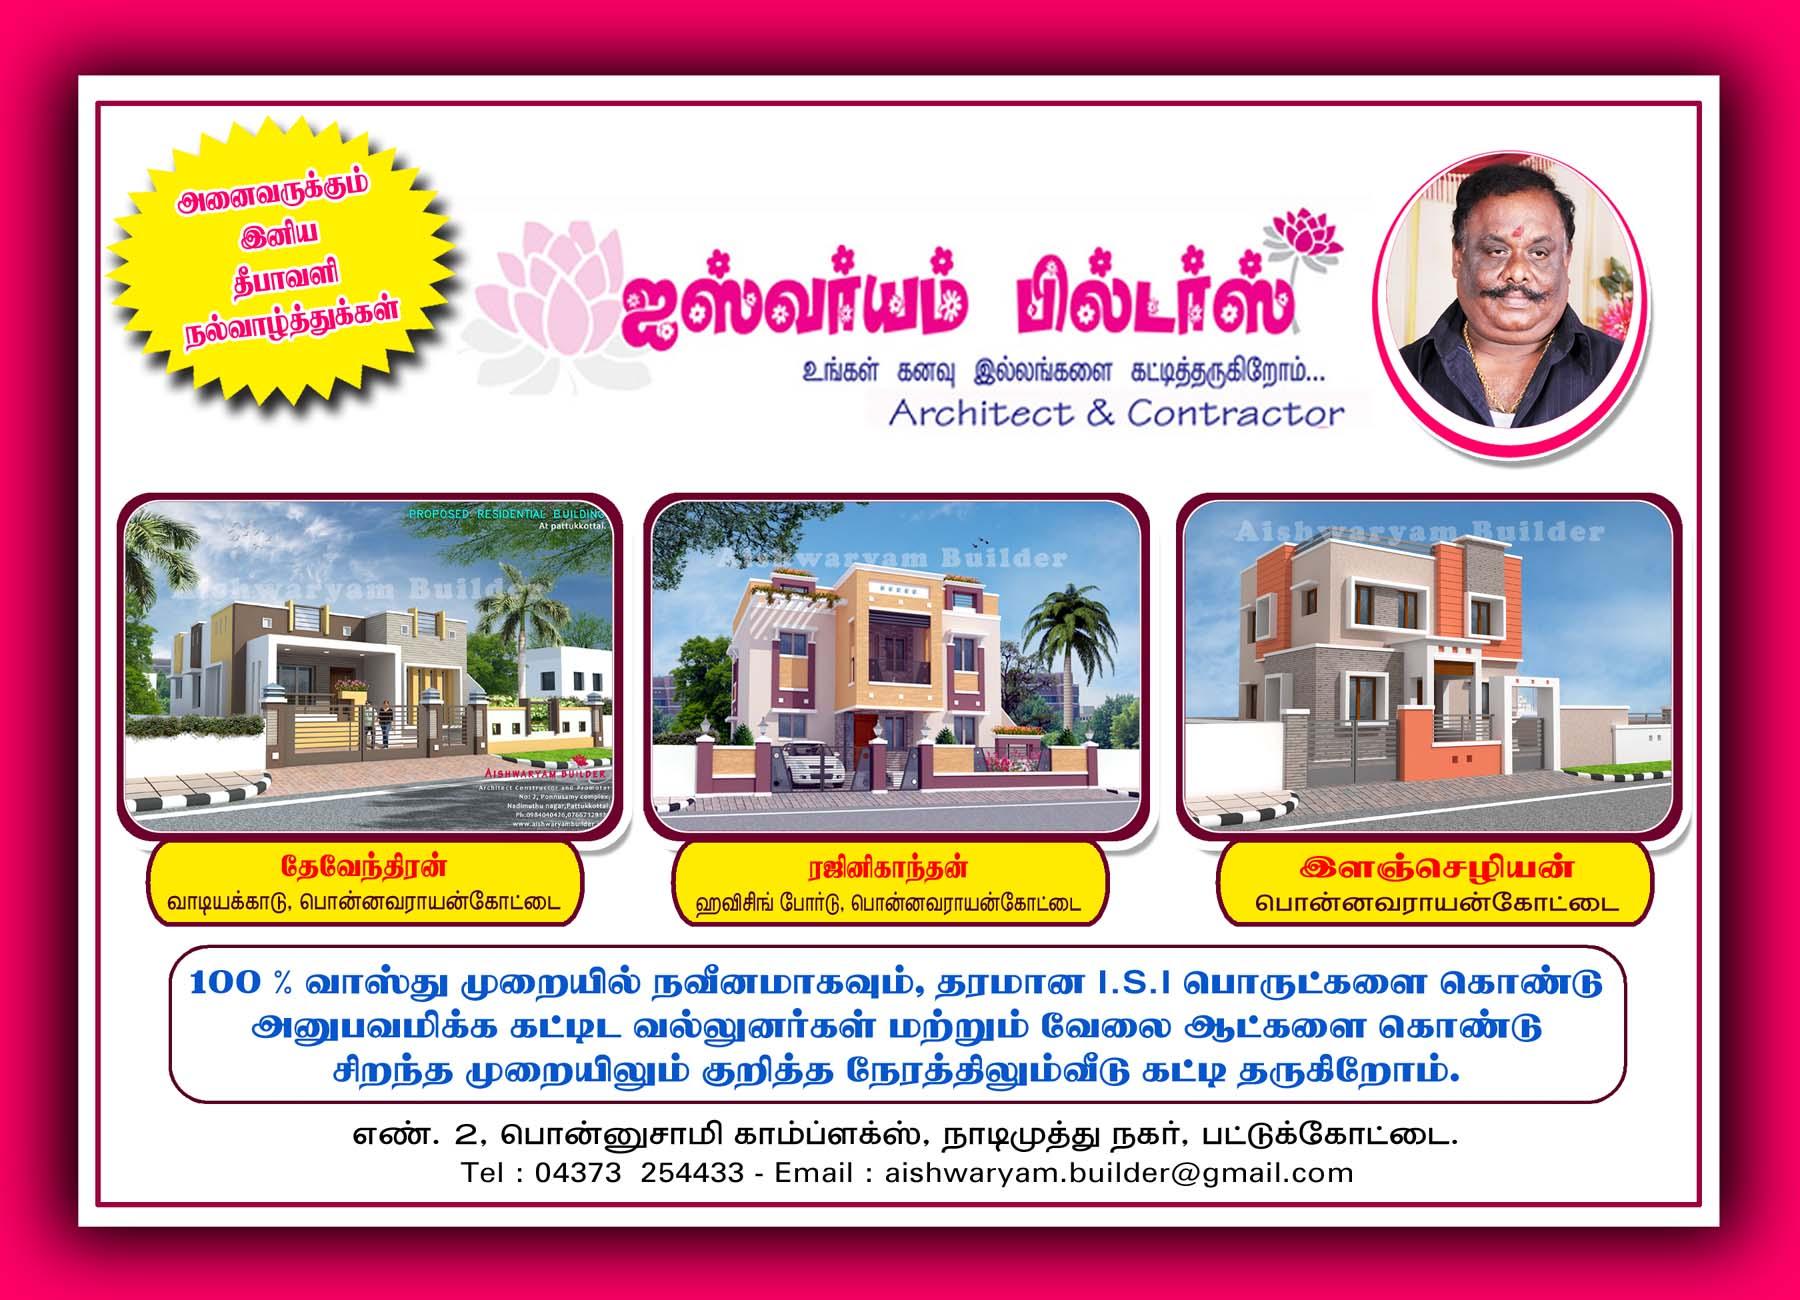 Aishwaryam builder Company poster